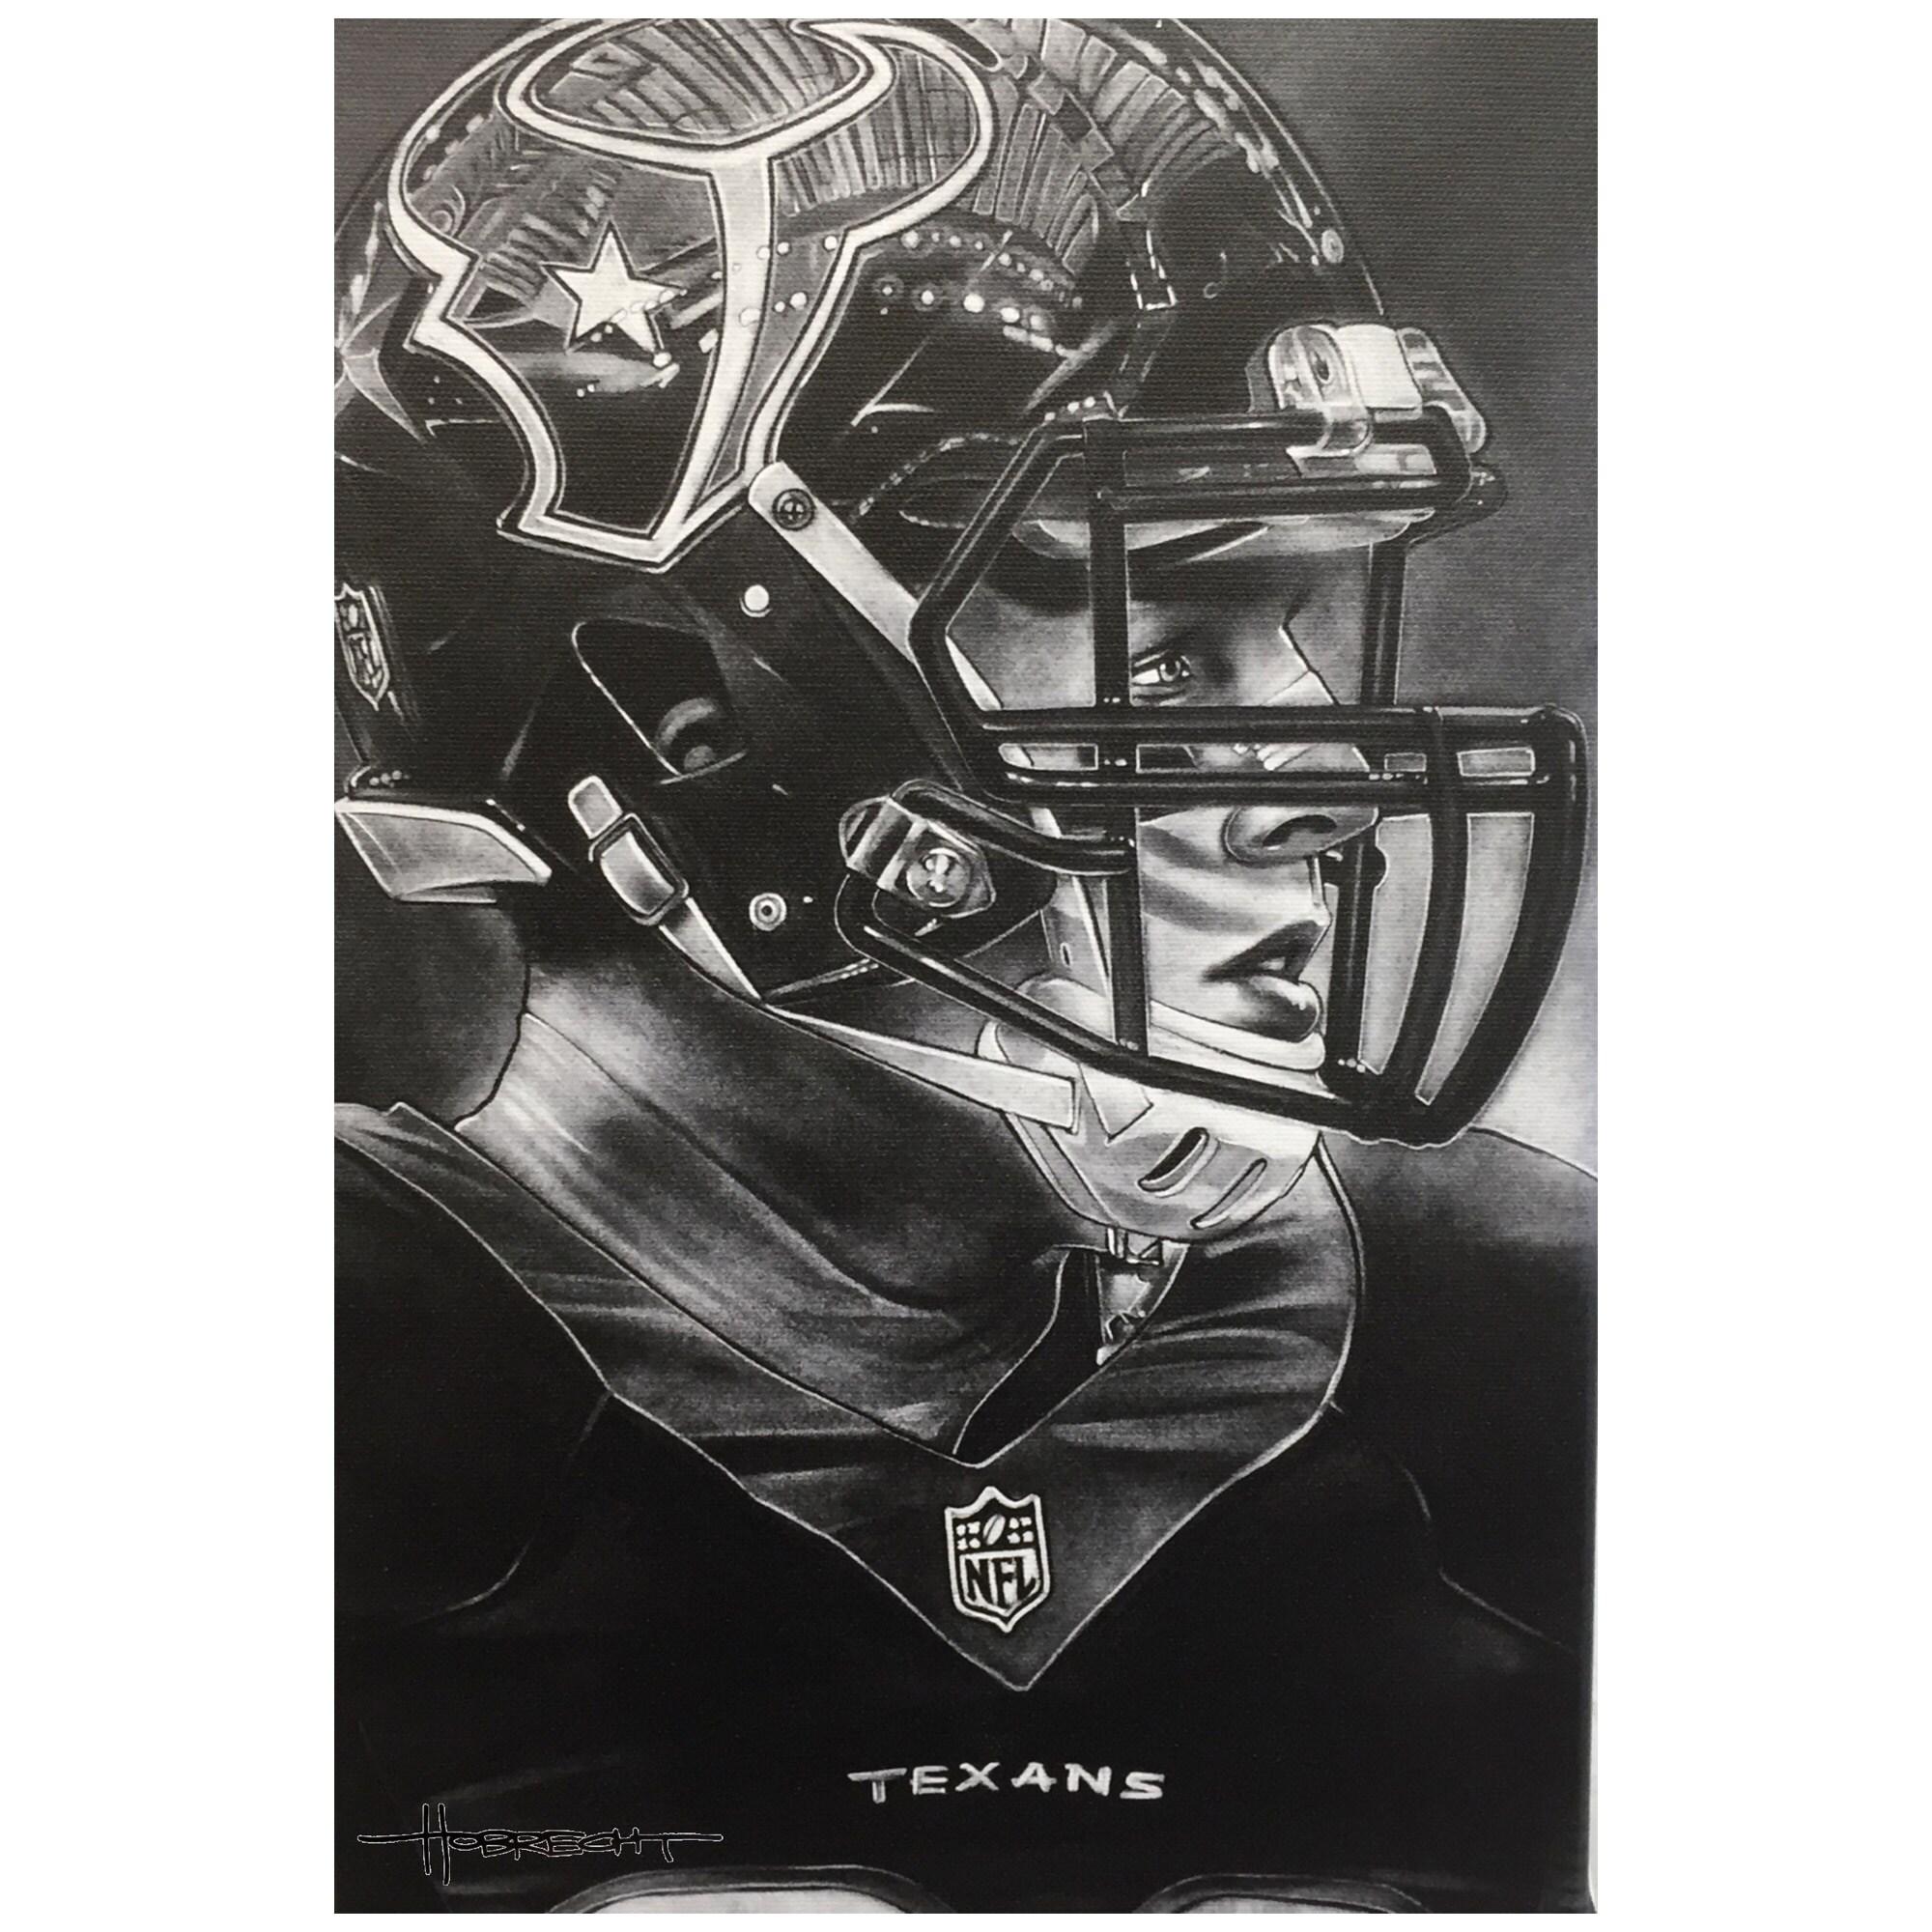 "Houston Texans Deacon Jones Foundation 14"" x 9"" Helmet Series Fine Art Giclée Canvas"